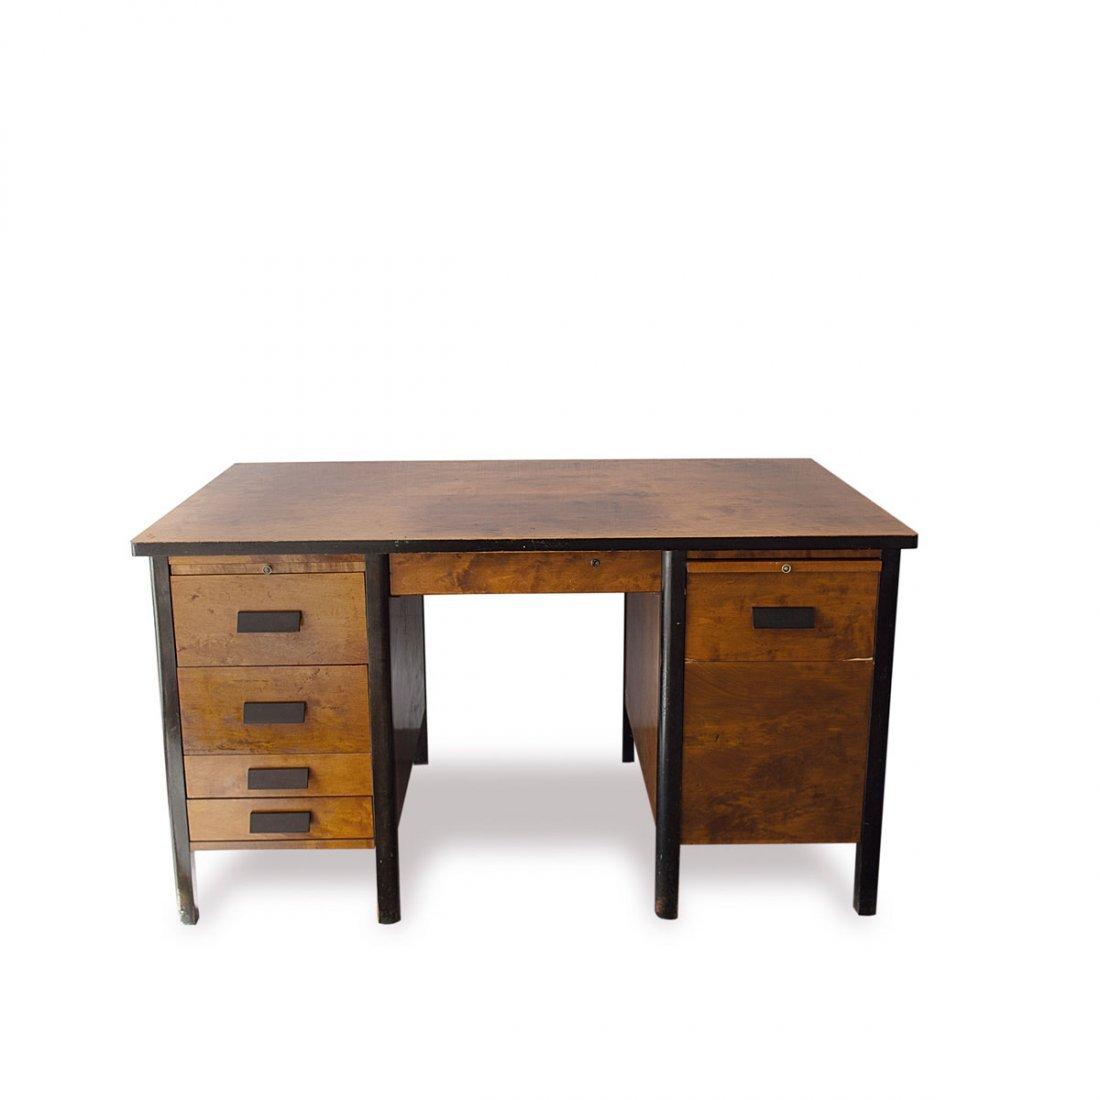 Einar Dahl. Writing desk and chair, 1934. Table: H. 77